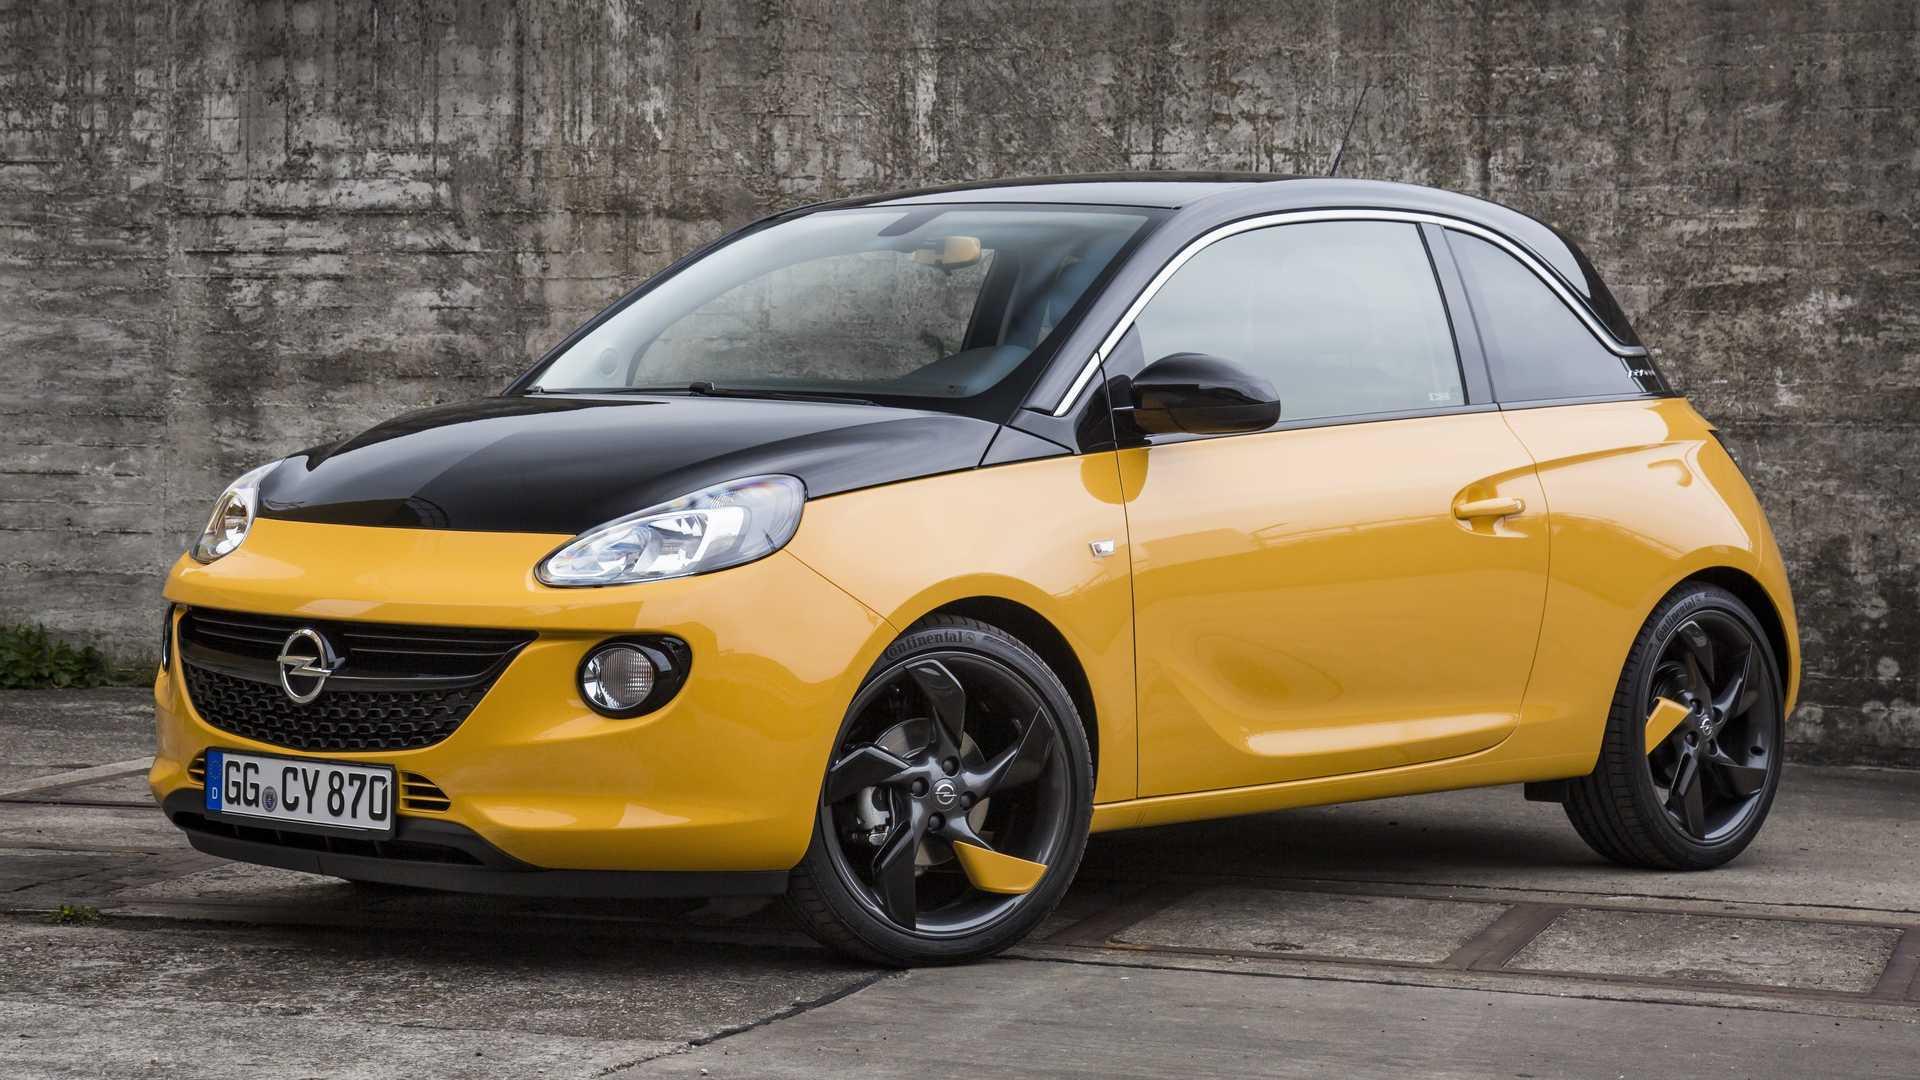 36 All New Opel Adam 2020 History by Opel Adam 2020